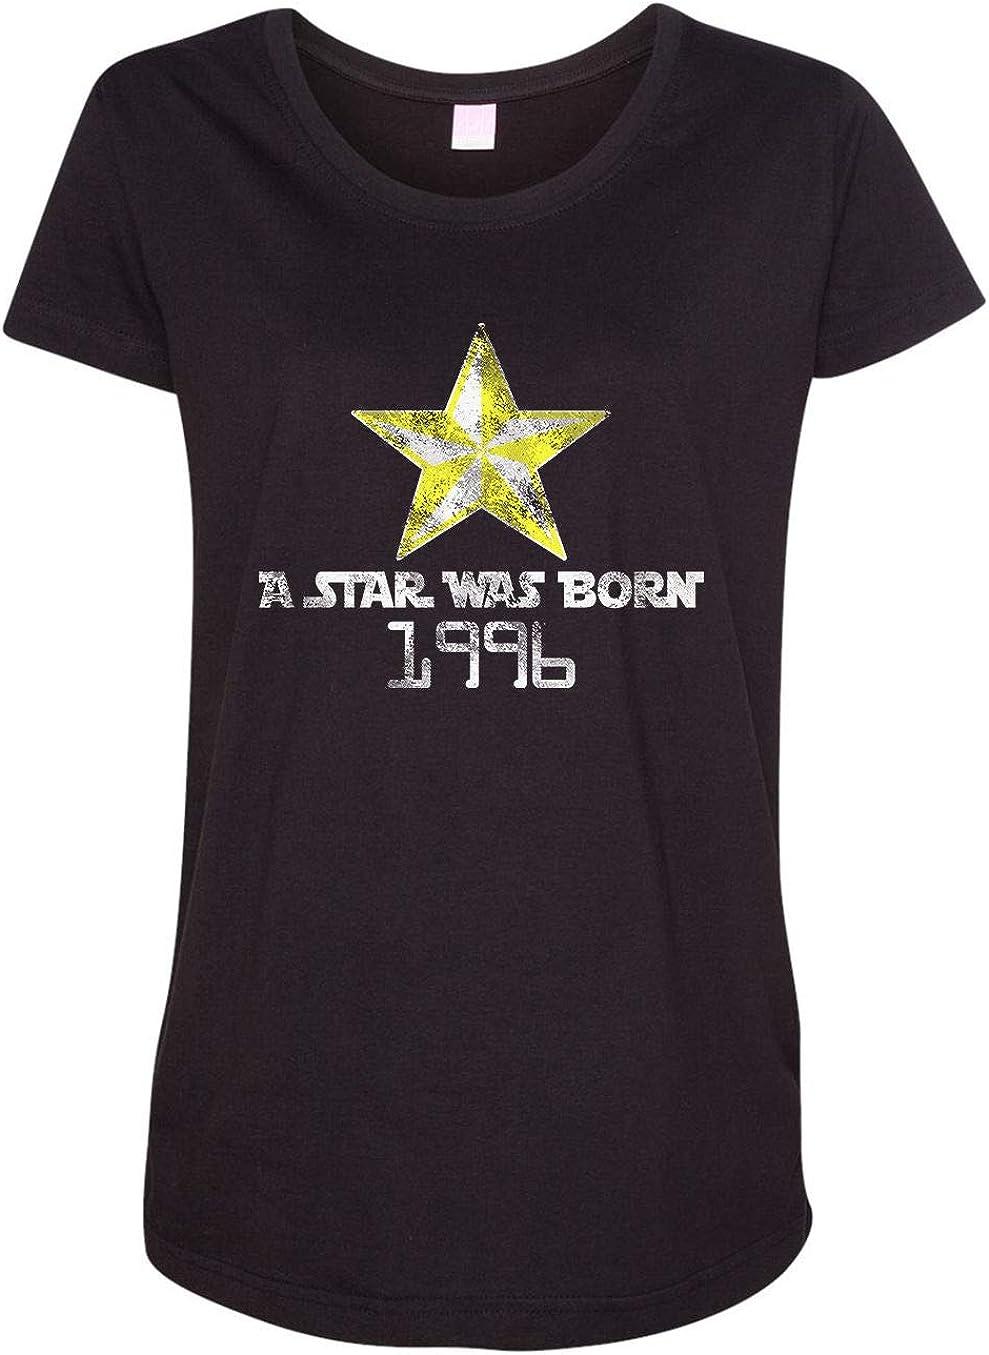 HARD EDGE DESIGN Women's A Star was Max Industry No. 1 62% OFF 1996 Born T-Shirt